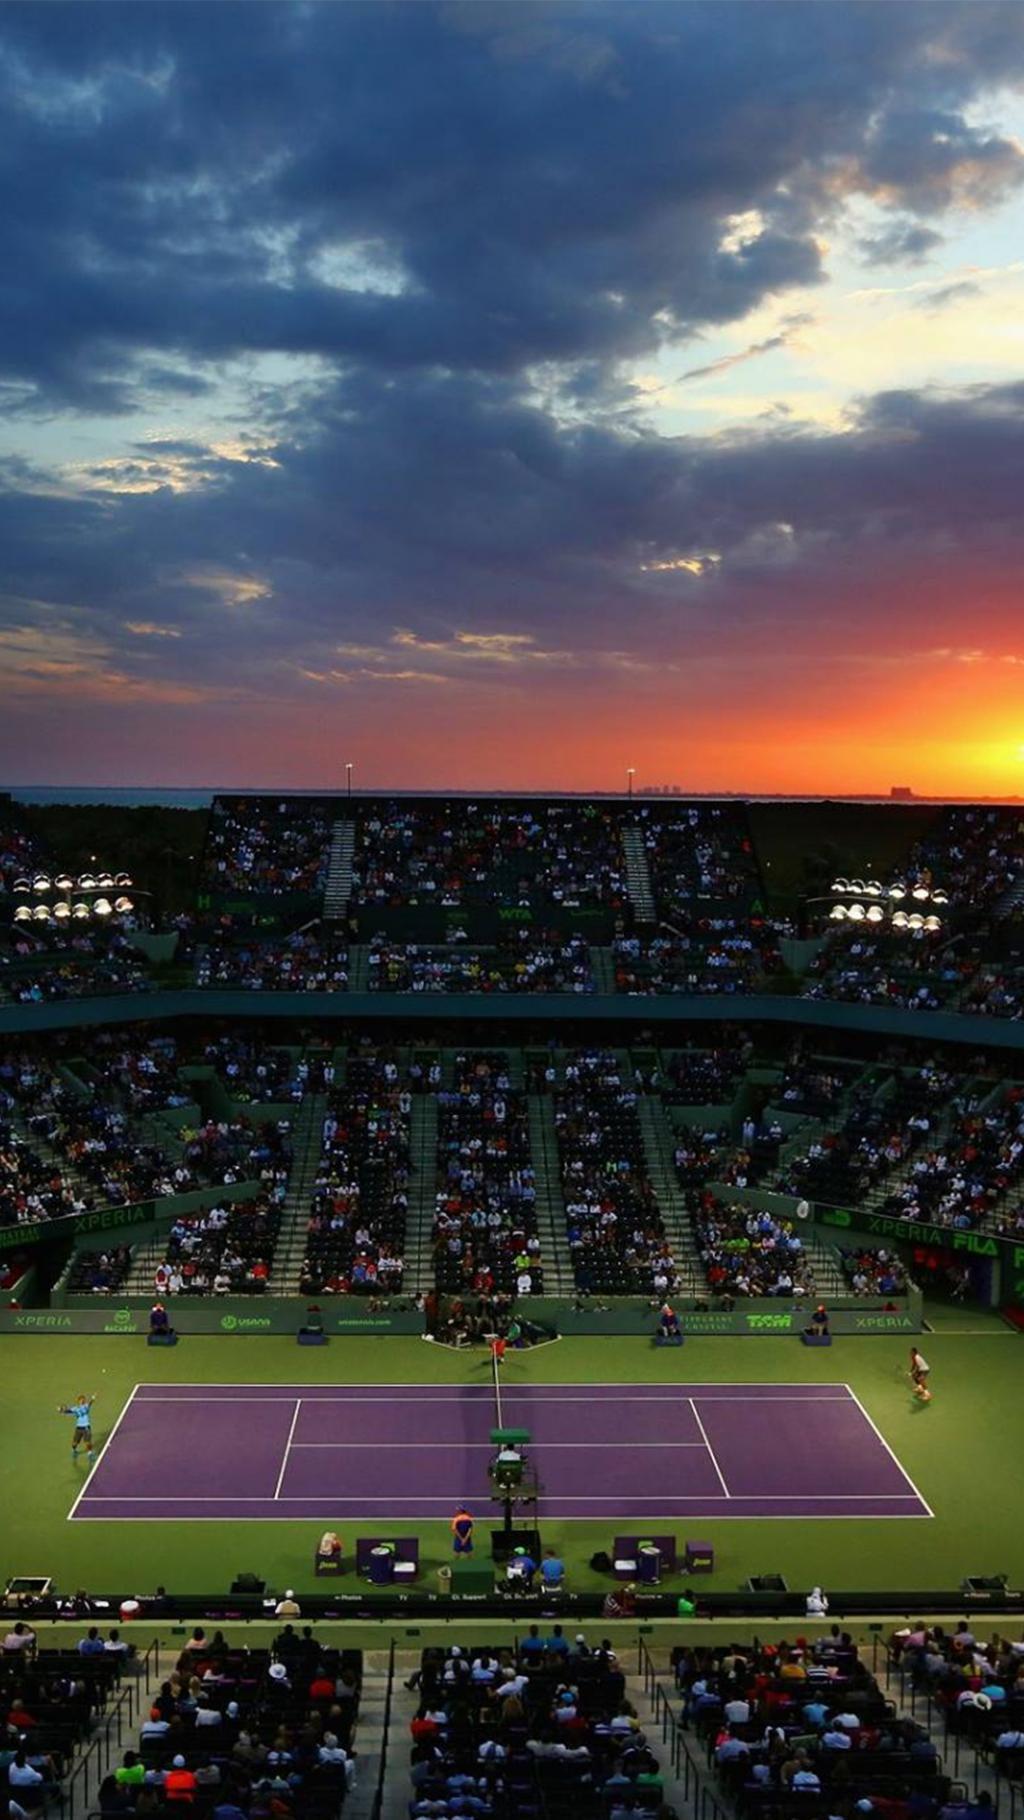 M Iphone Wallpaper 日落迈阿密公开网球场 锁屏图片 高清手机壁纸 体育 回车桌面